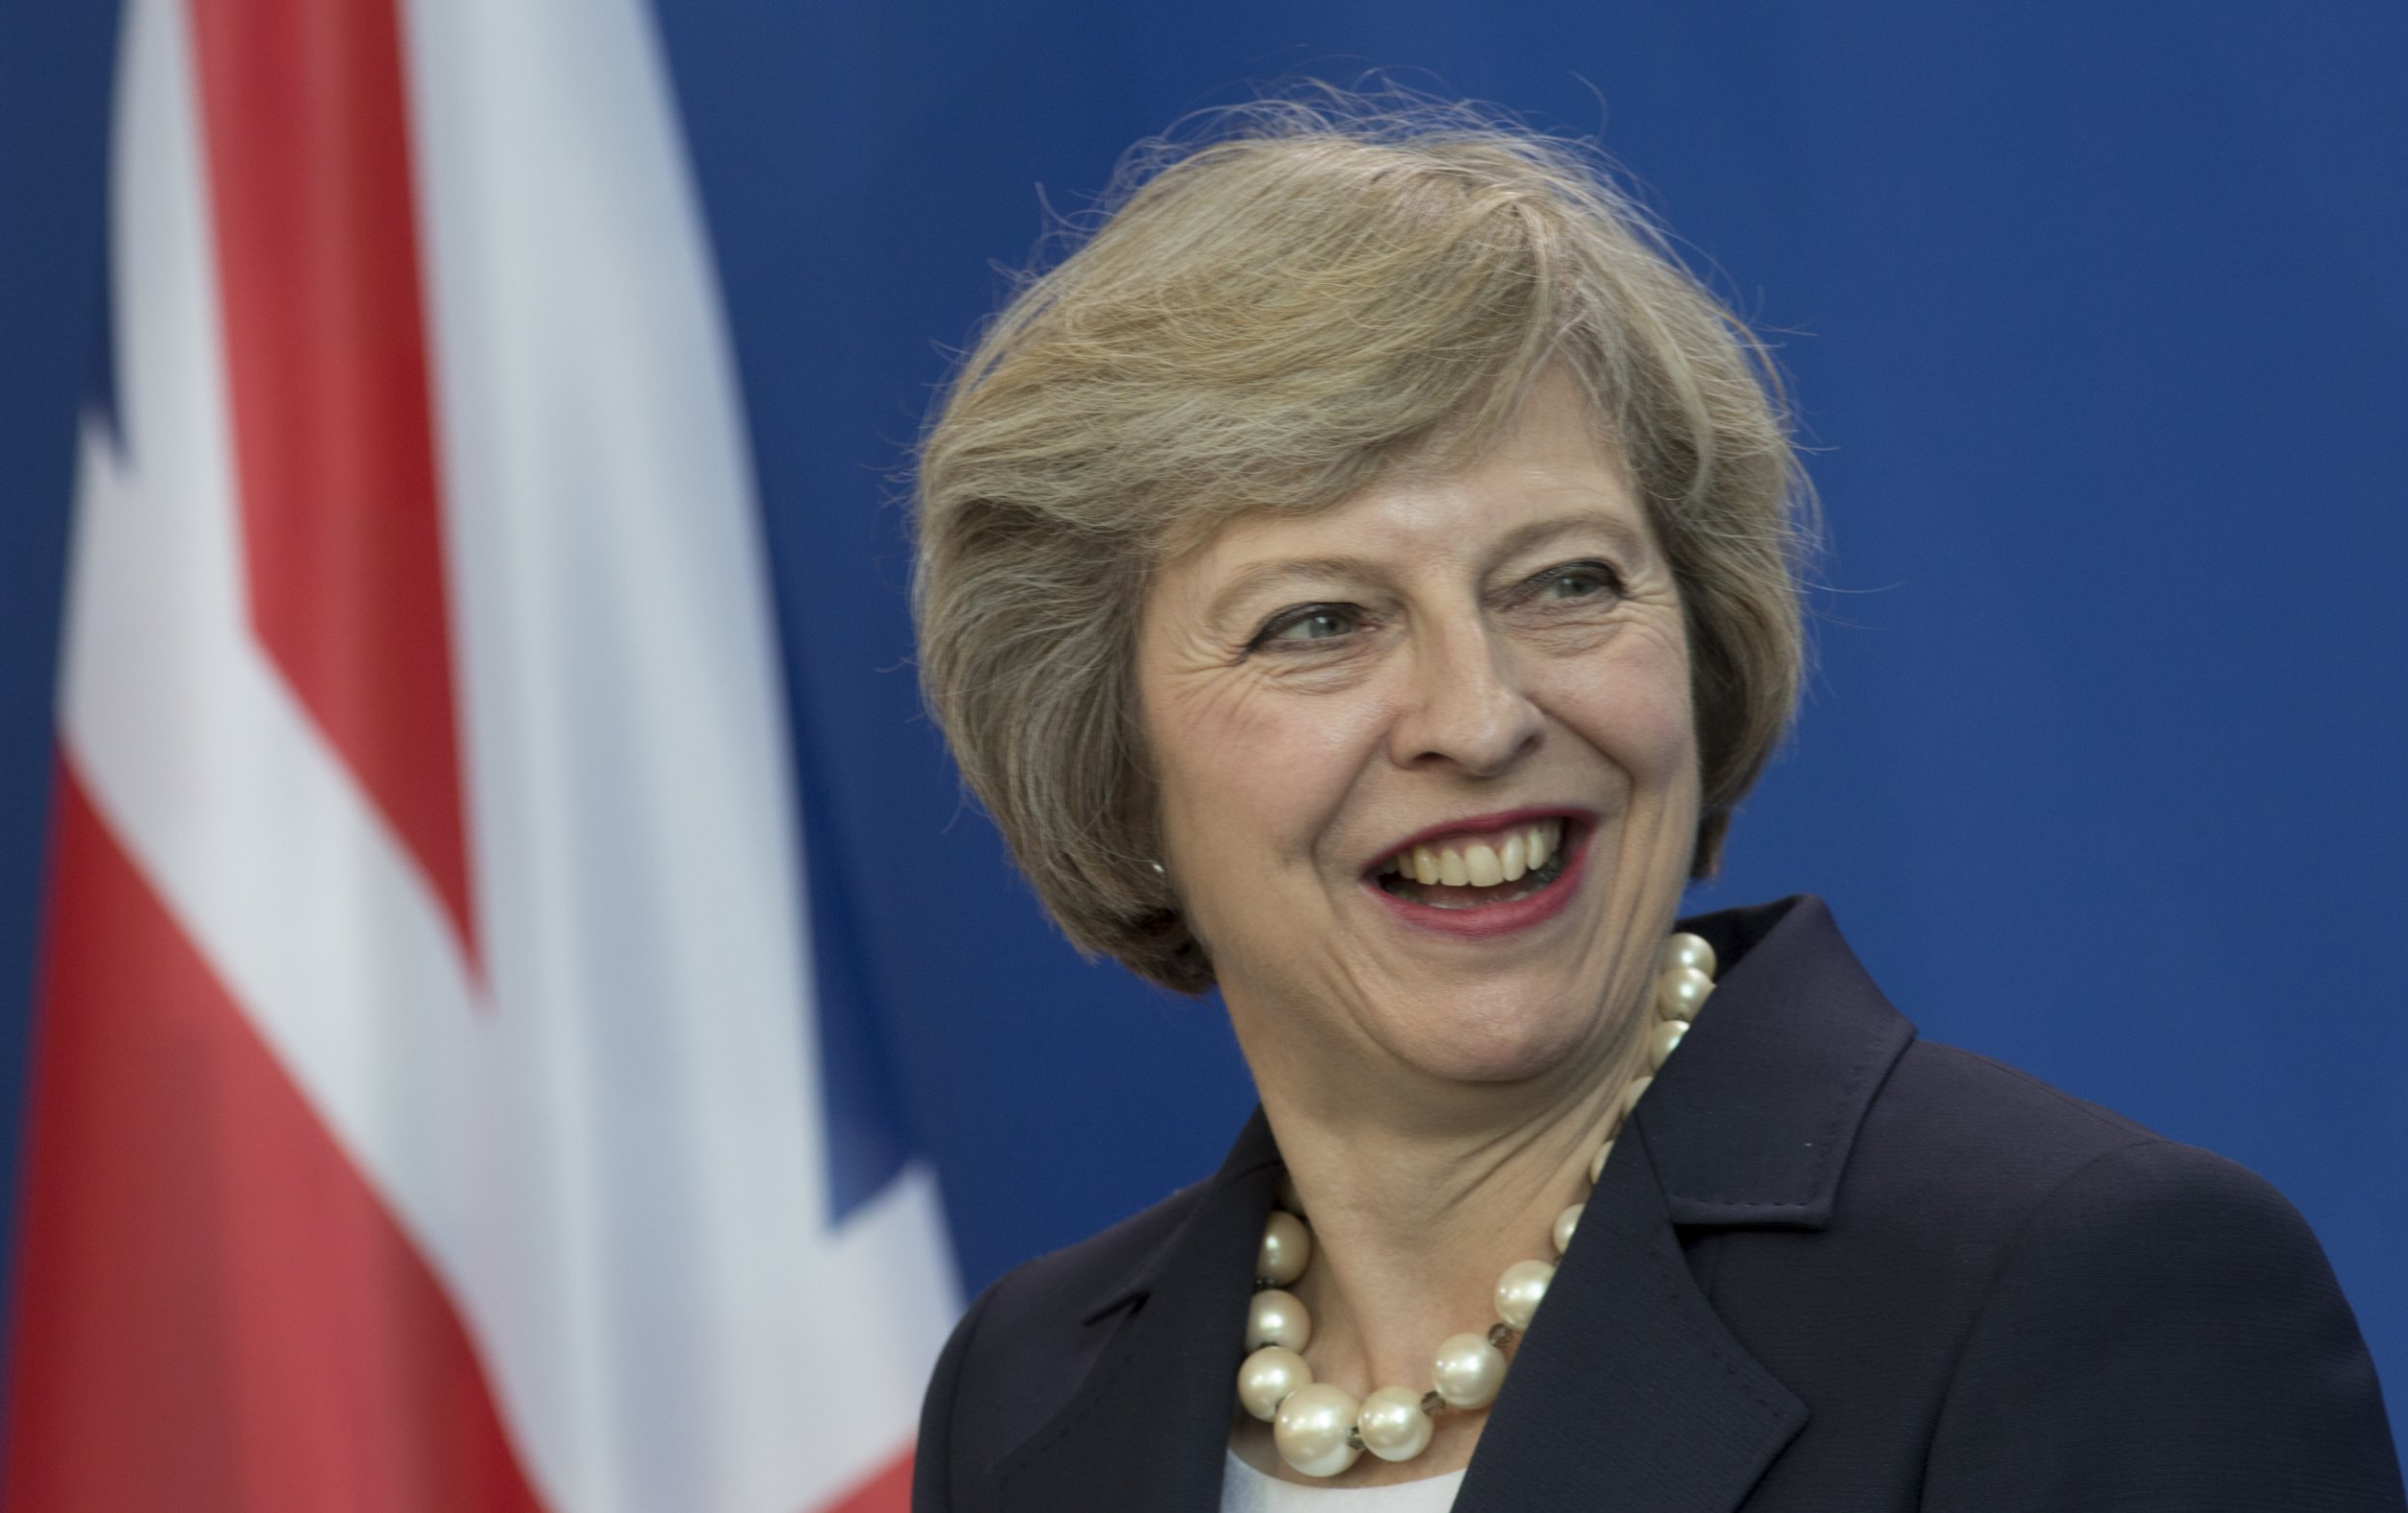 Theresa May to bring back selective state schools after 18 year ban